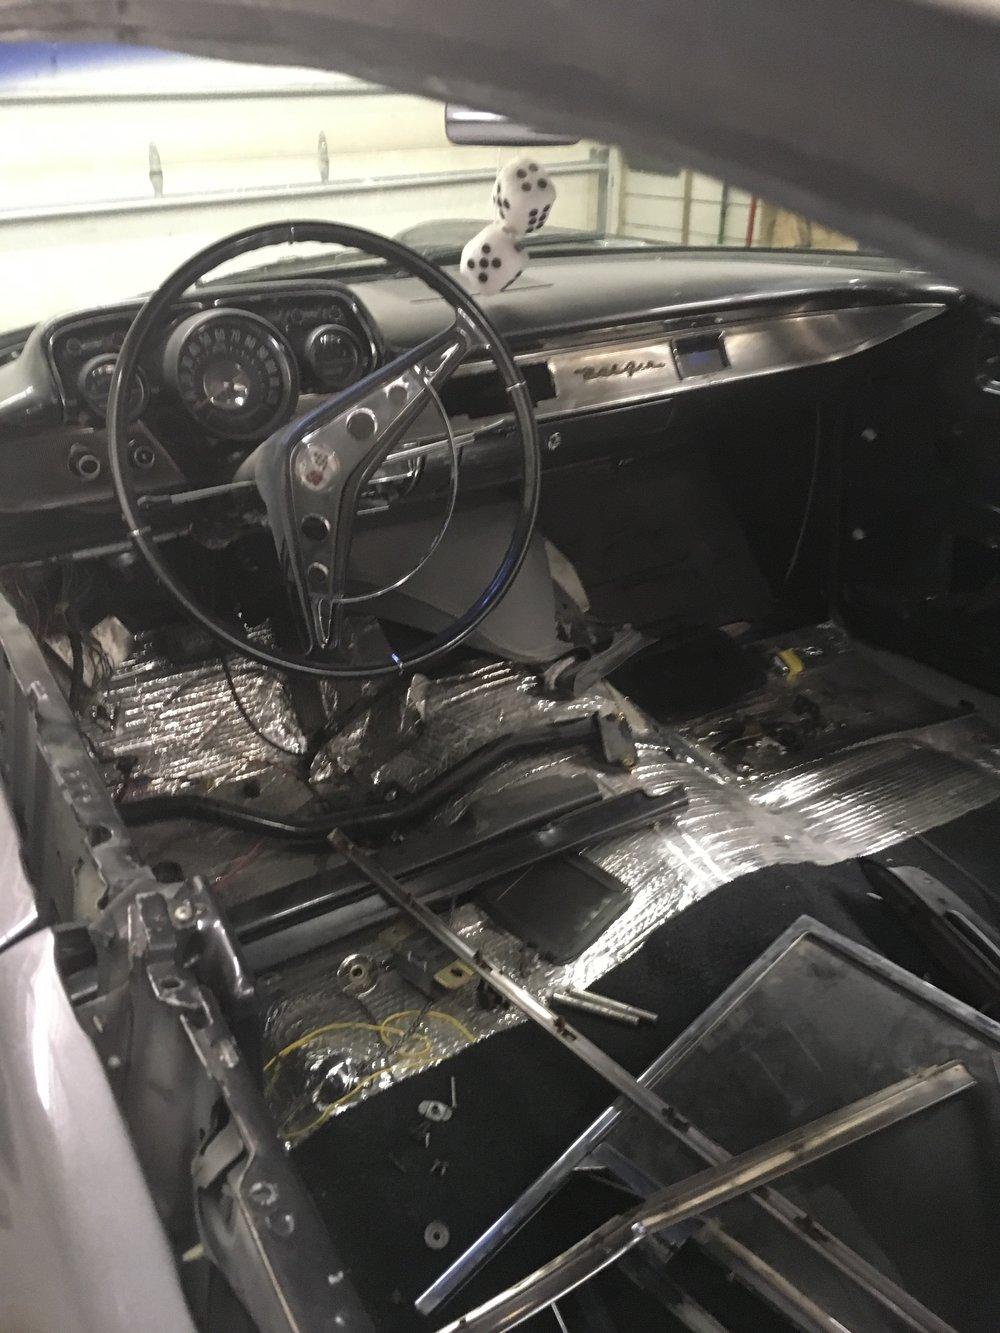 1957-4-door-bel-air-minnesota-muscle-car-restoration-hot-rod-factory.jpg